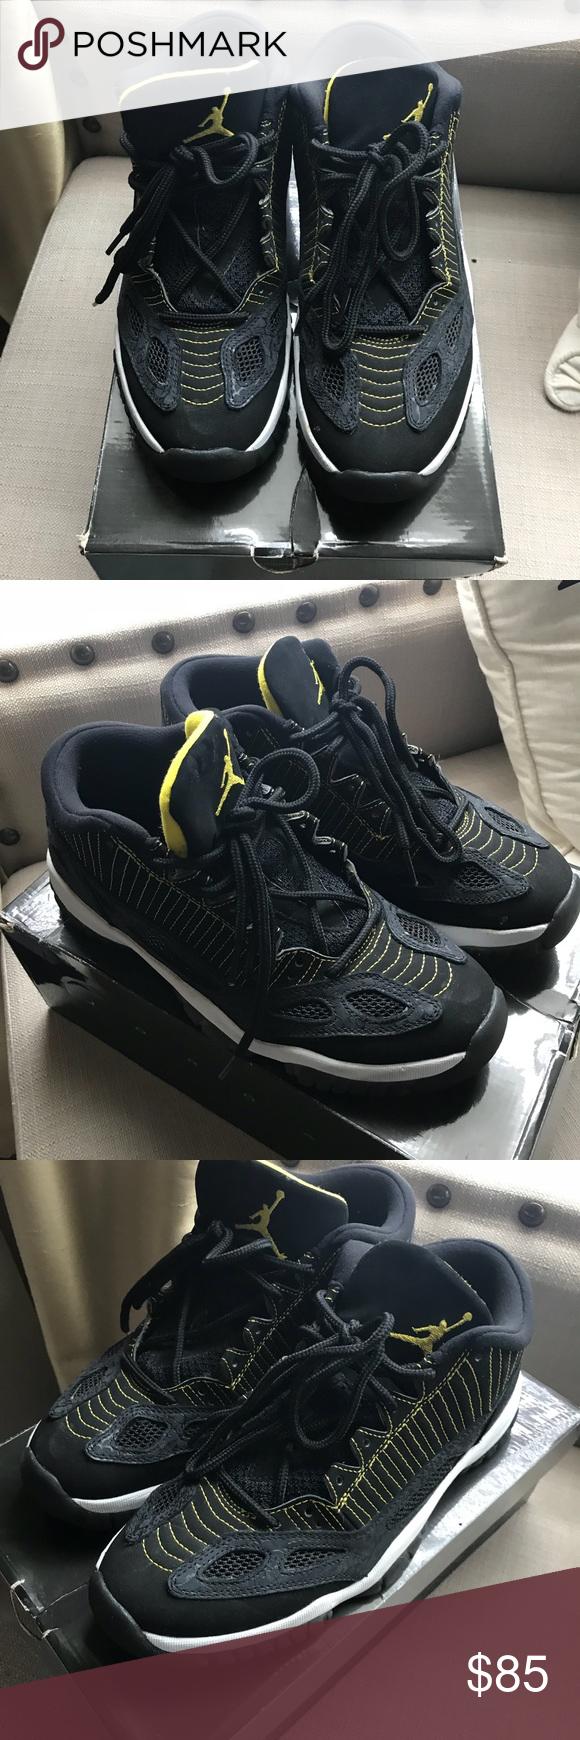 c89f971df1d7 Nike Air Jordan 11 Retro low Men Size 9 Nike Air Jordan 11 Retro low Men  Size 9 Black and yellow Great shape OG box Jordan Shoes Athletic Shoes